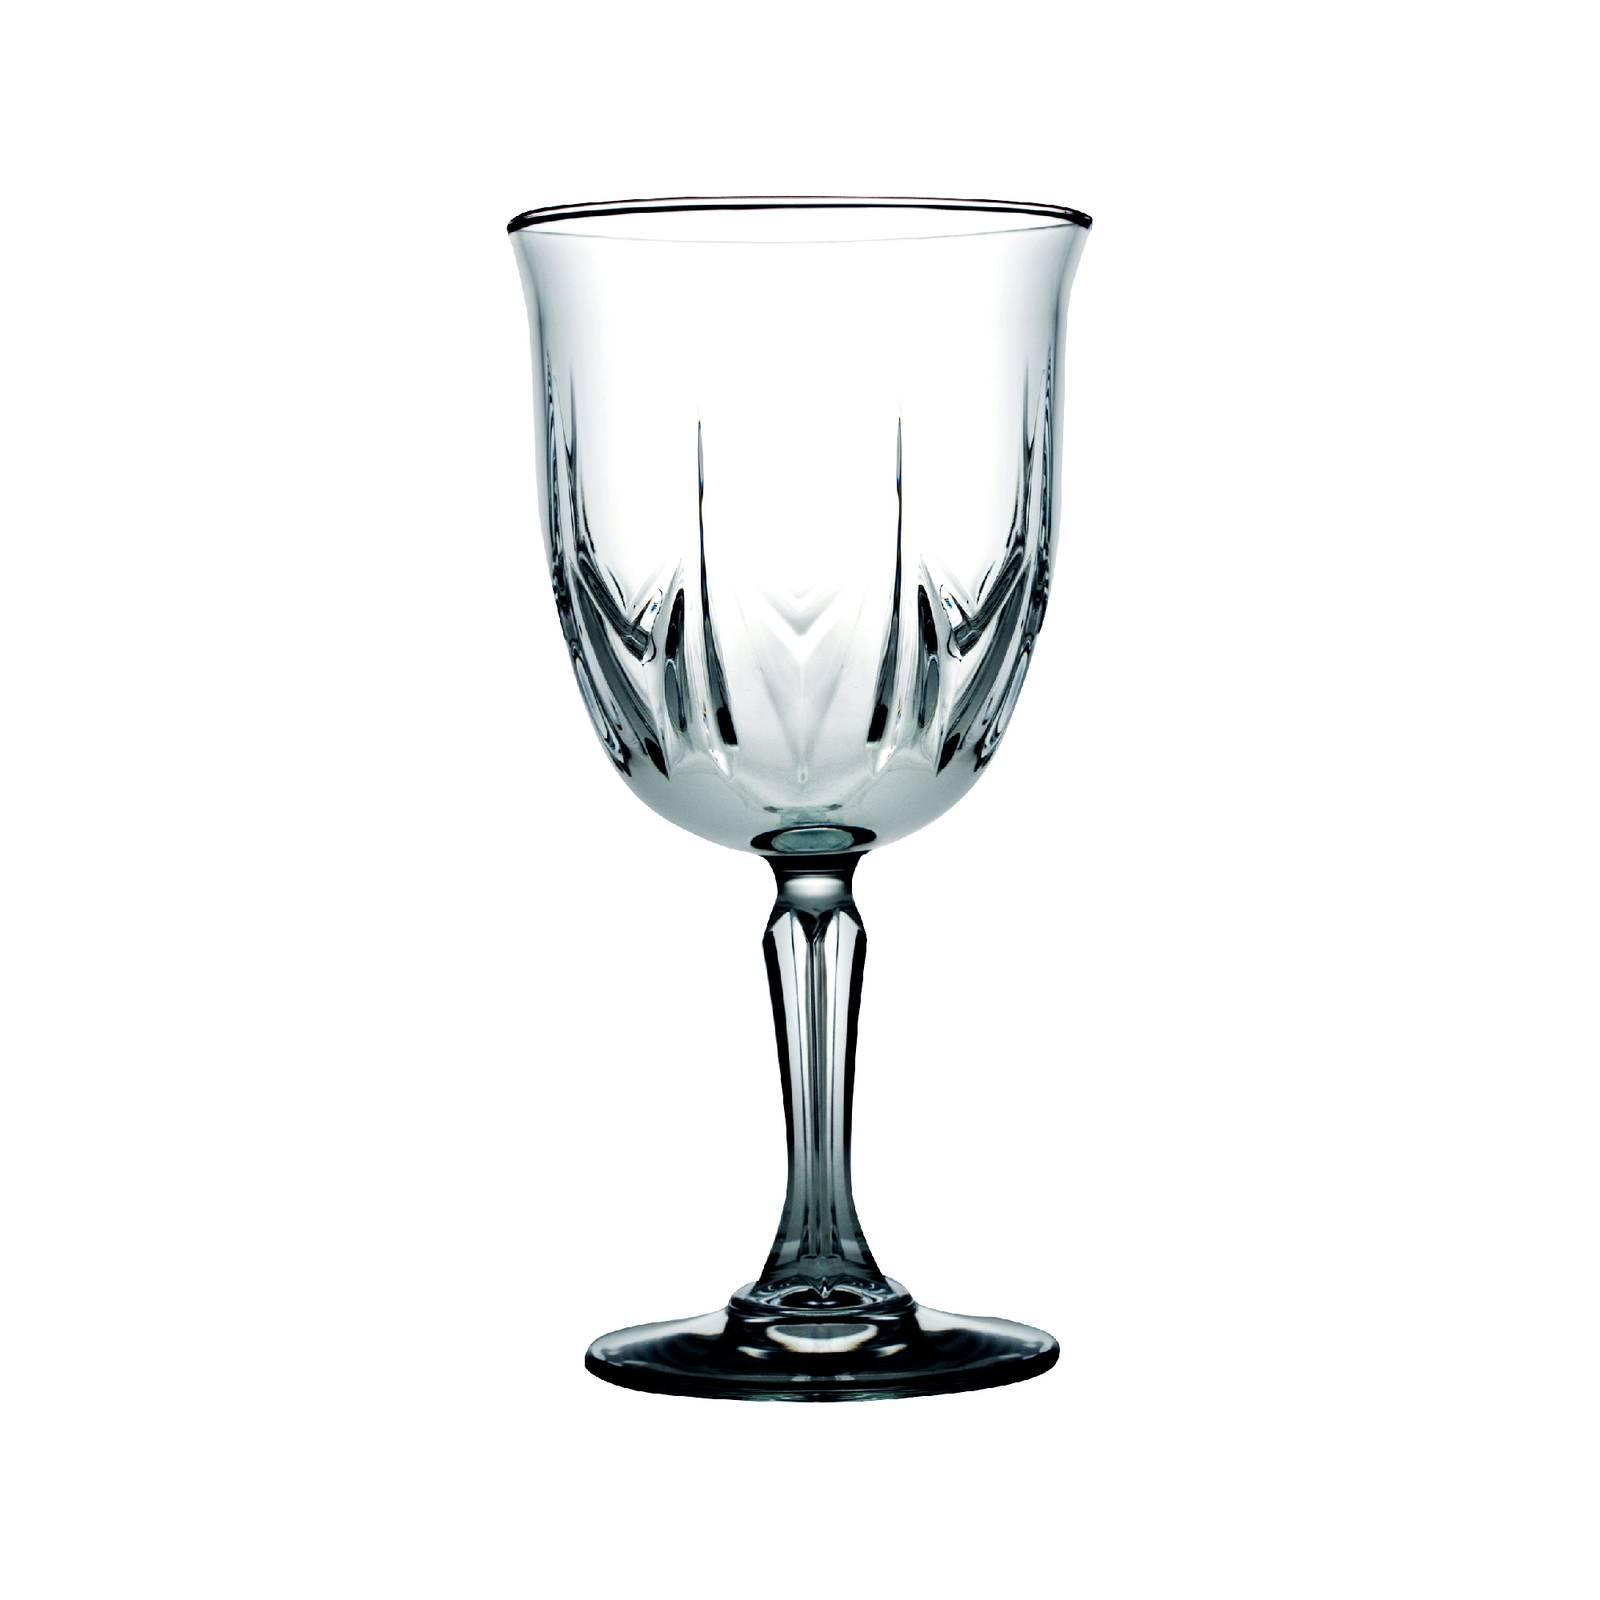 Set of 6 wine glasses Karat 335 ml PASABAHCE